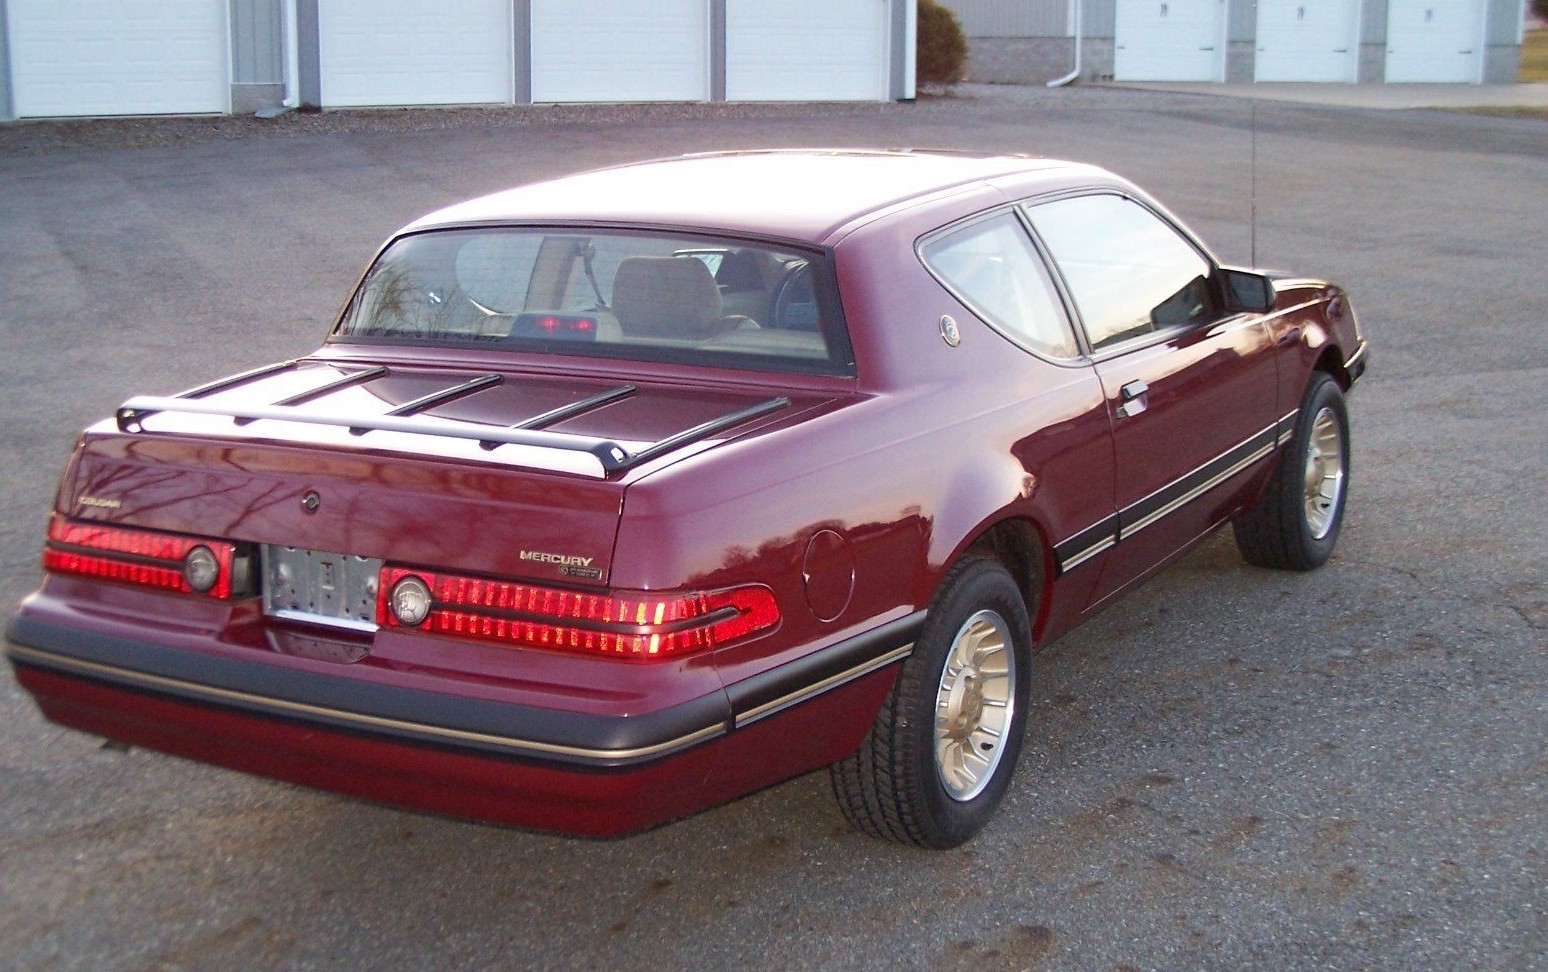 Ford Mercury Cougar >> Gentleman's Mustang: 1987 Mercury Cougar